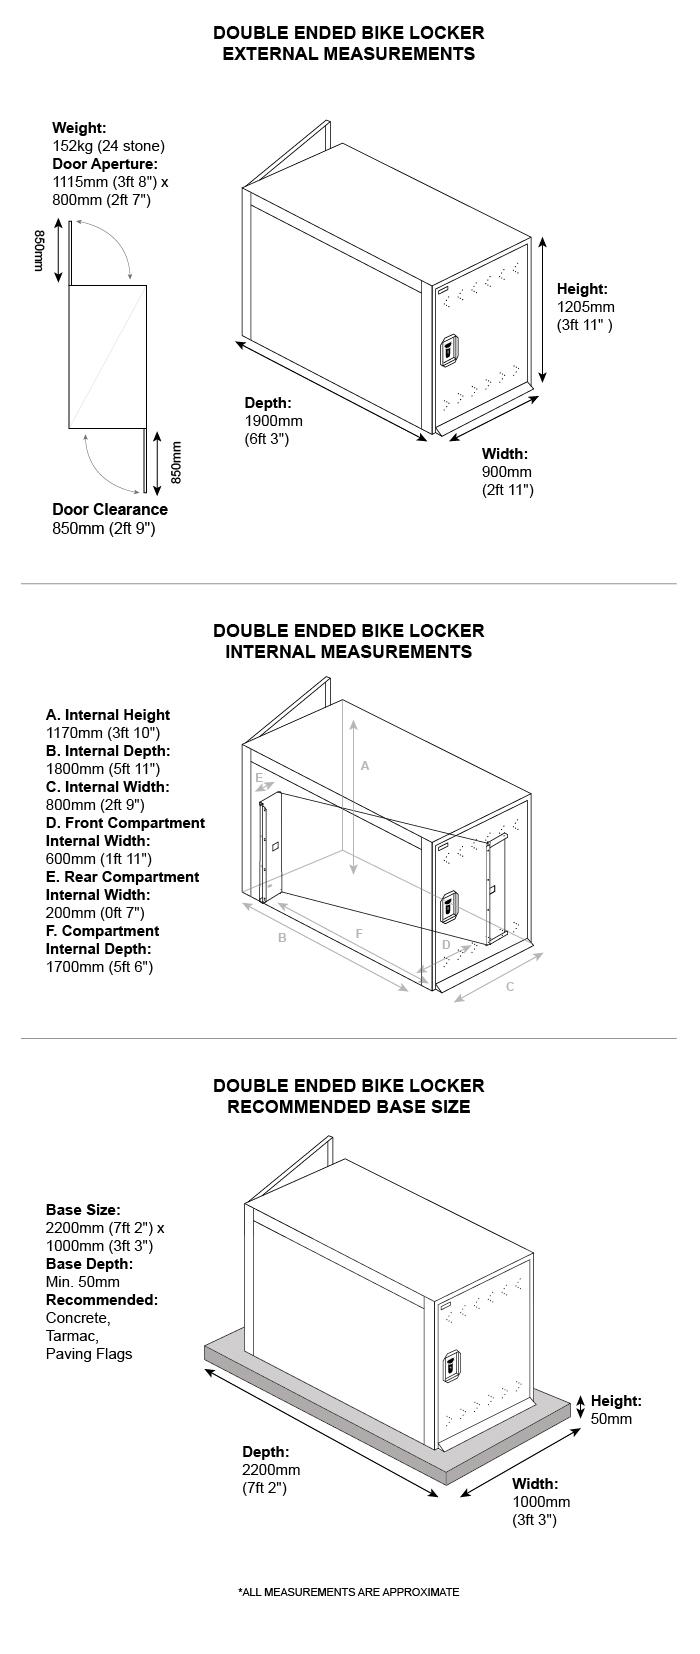 Double Ended Bike Locker Dimensions